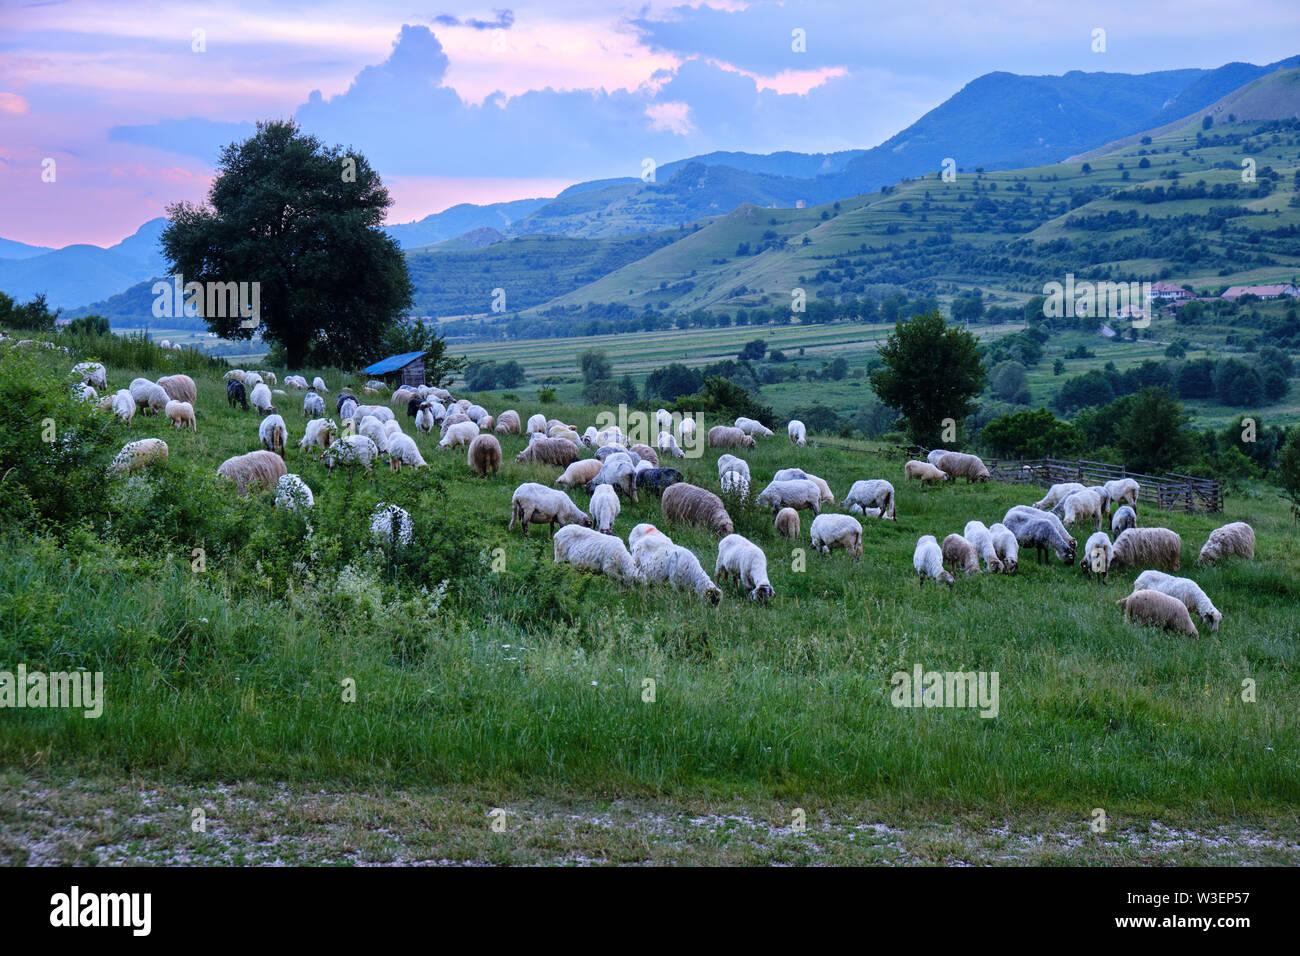 Sheep flock at sunset, on a grass filed above Rimetea village, in Transylvania, Romania. - Stock Image